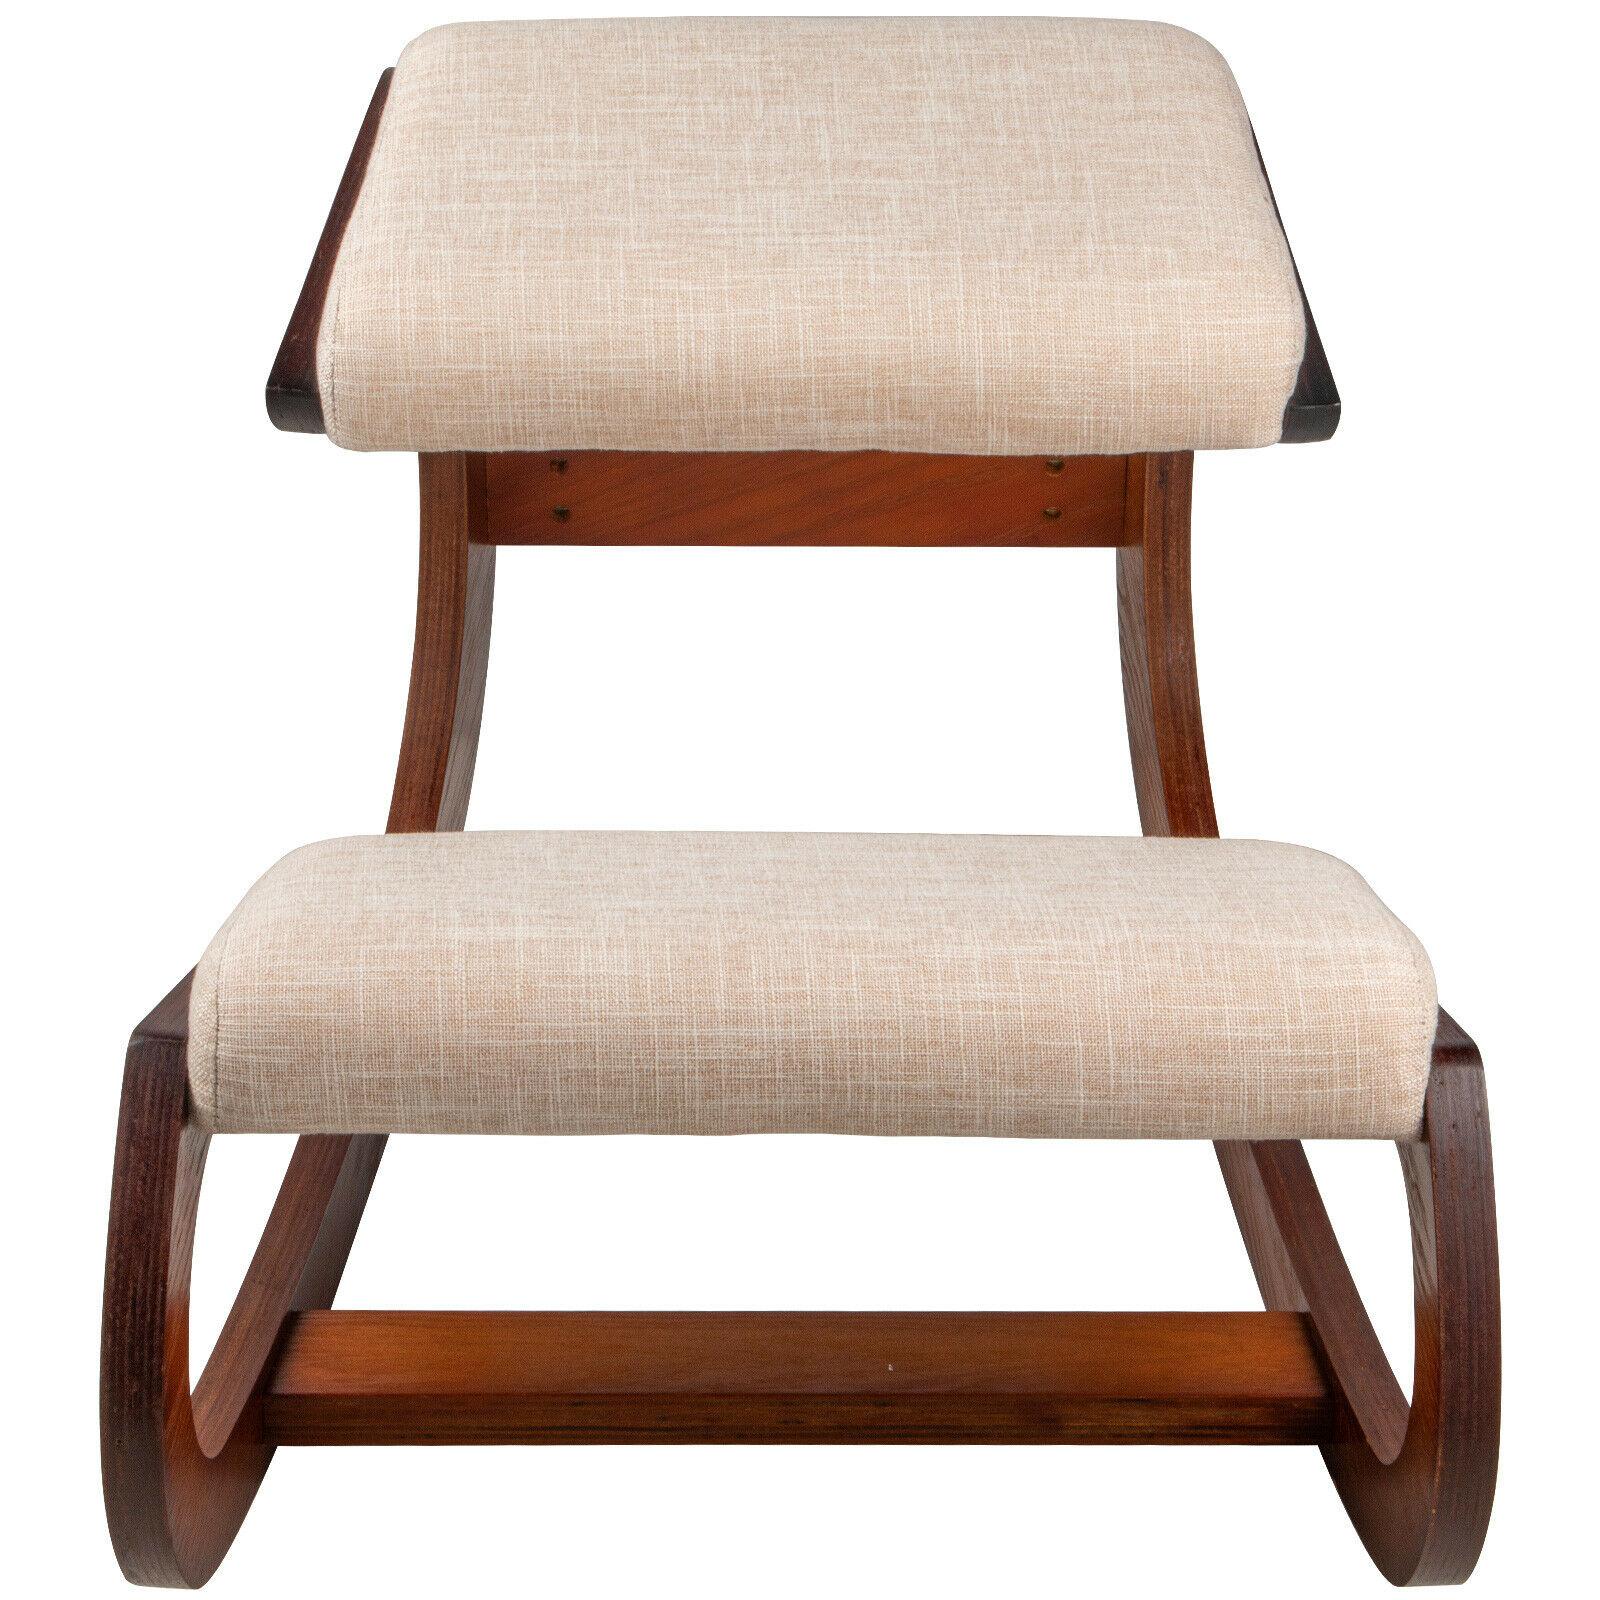 220LB Ergonomic Kneeling Chair Load Capacity Kneeling Posture Desk Chair Stool with Hip Cushion Kneeling Ergonomic Stool